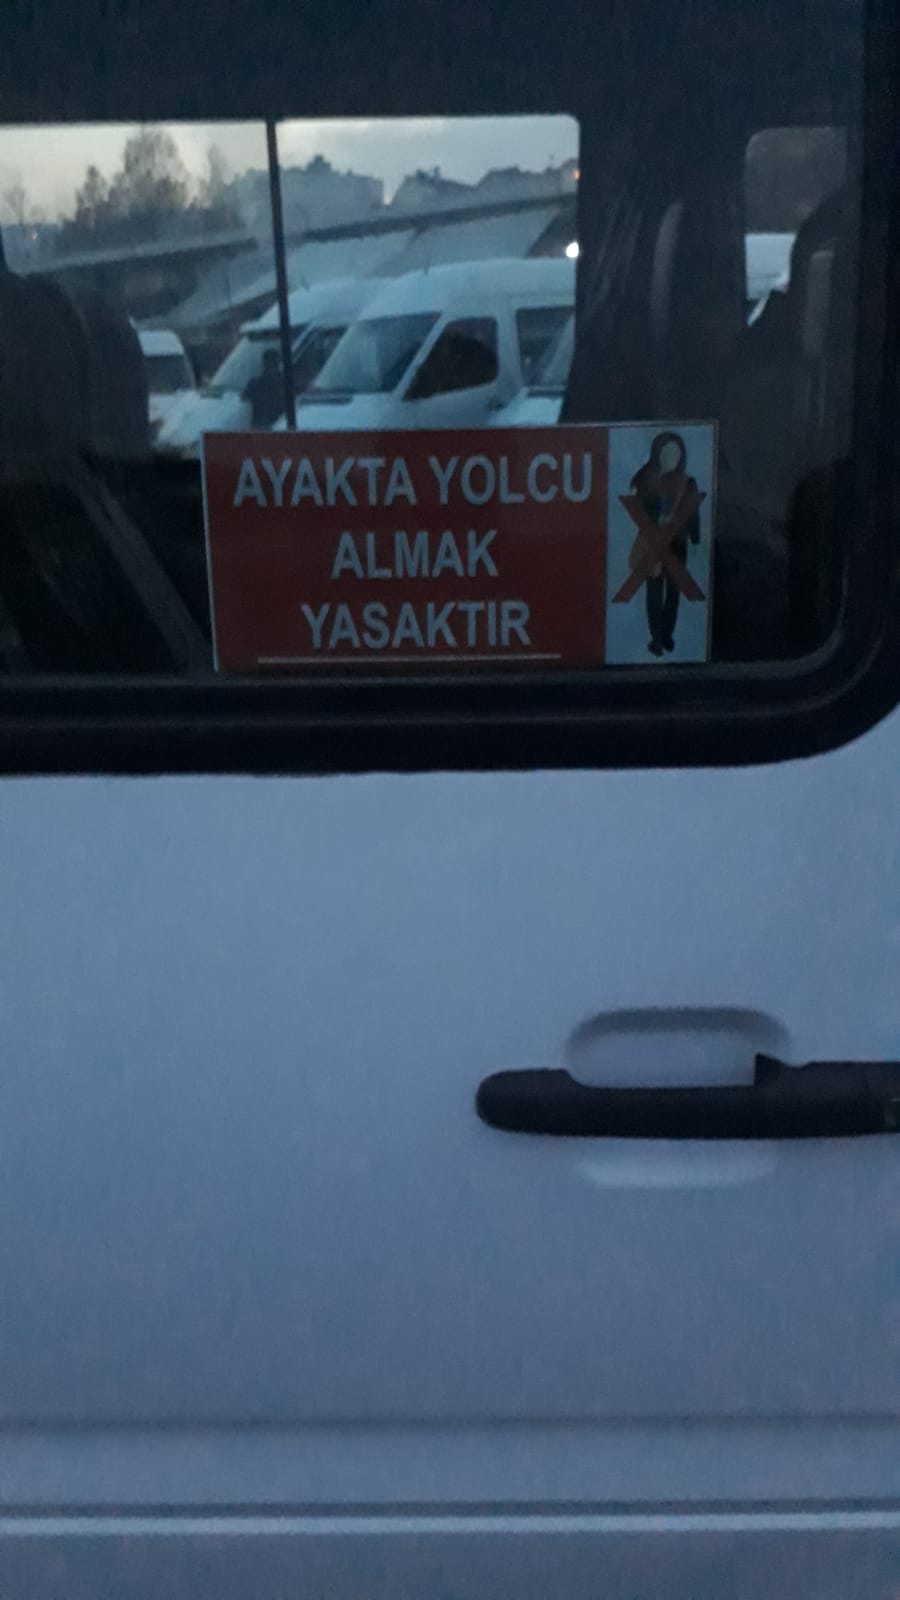 Trabzon'daki kaza sonrası Akçaabat hattında flaş gelişme